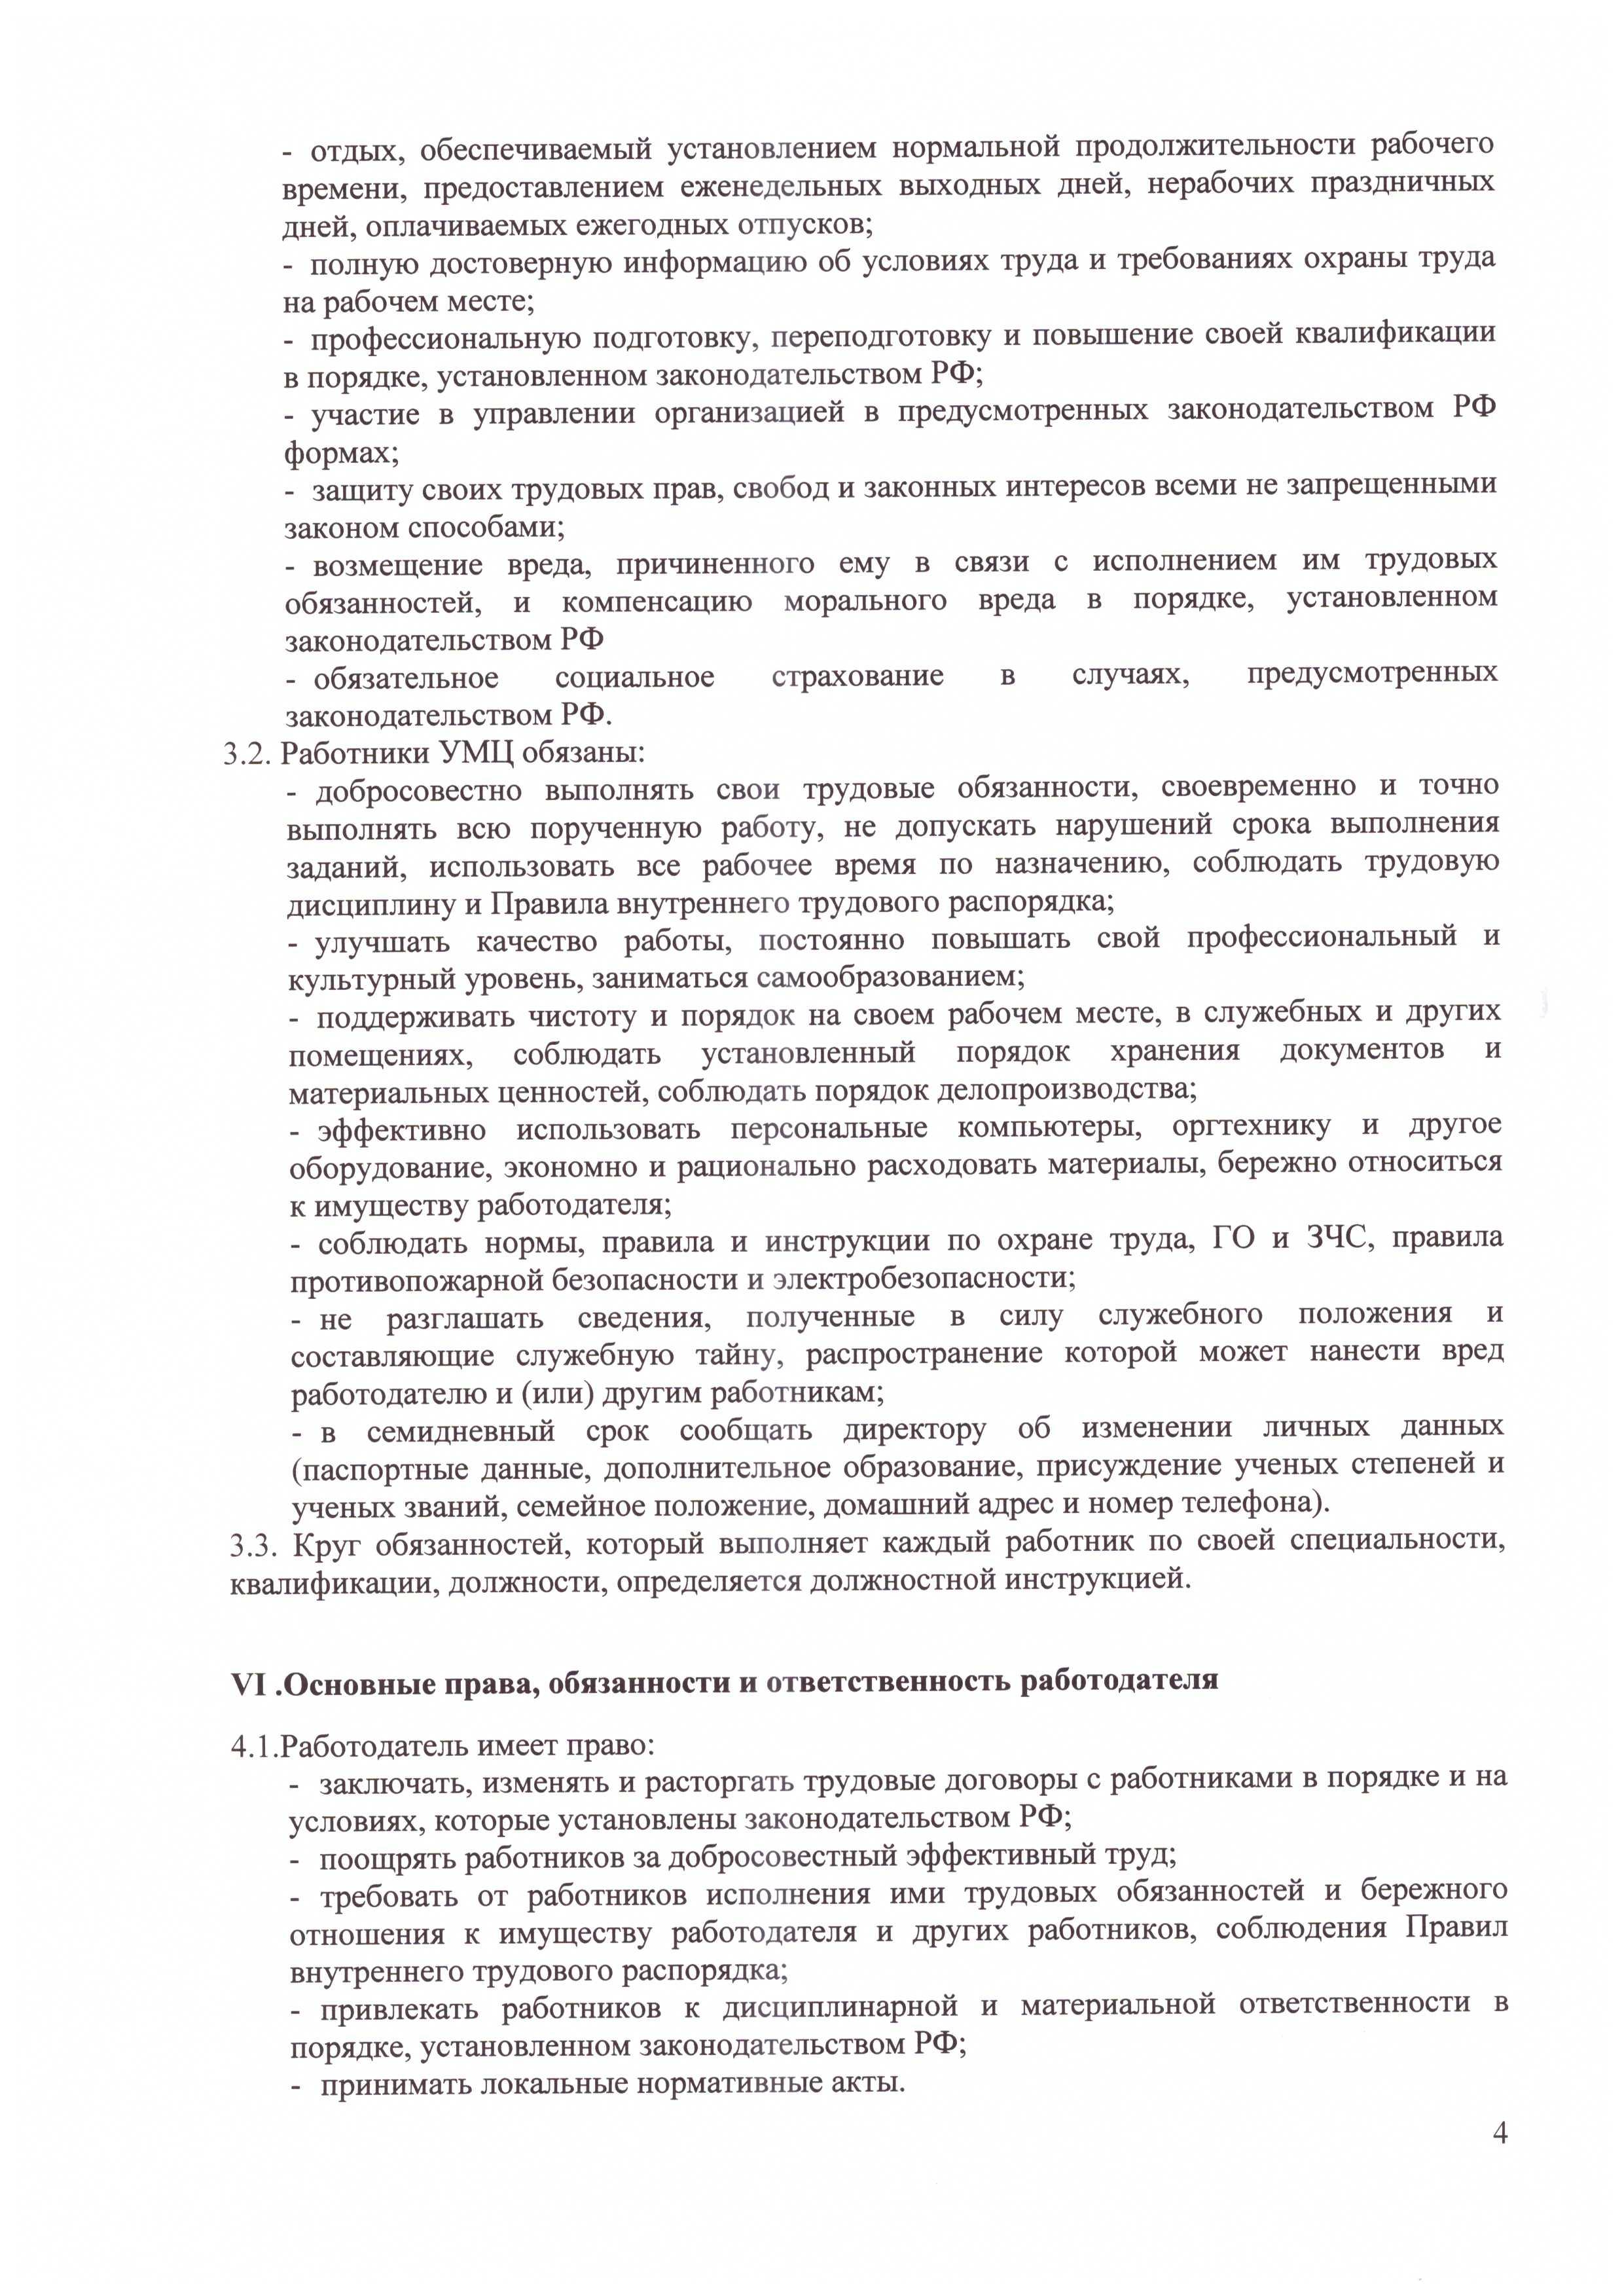 SCAN_правила внутр.распор_Страница_4